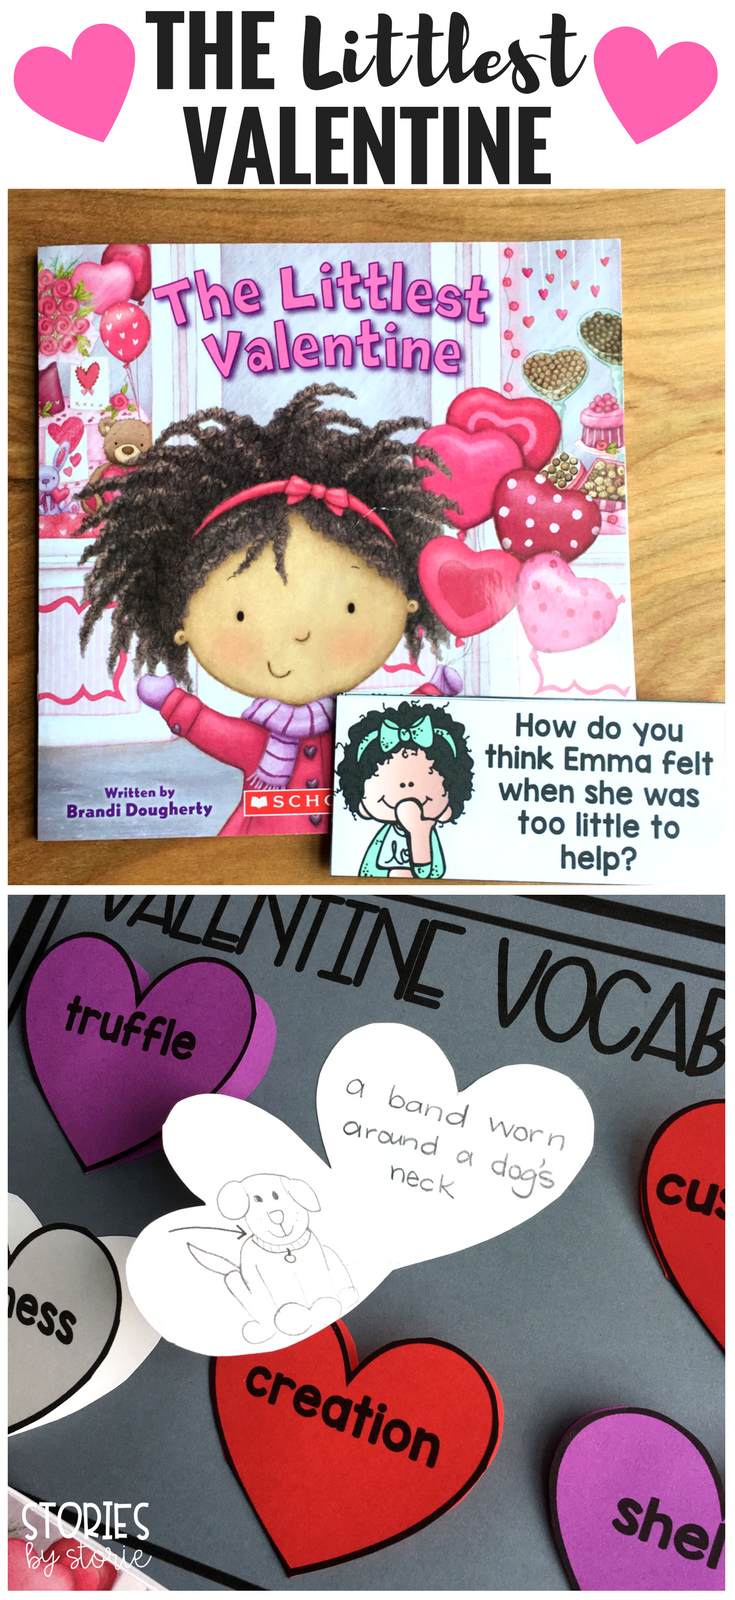 The littlest valentine by brandi dougherty is a sweet little story